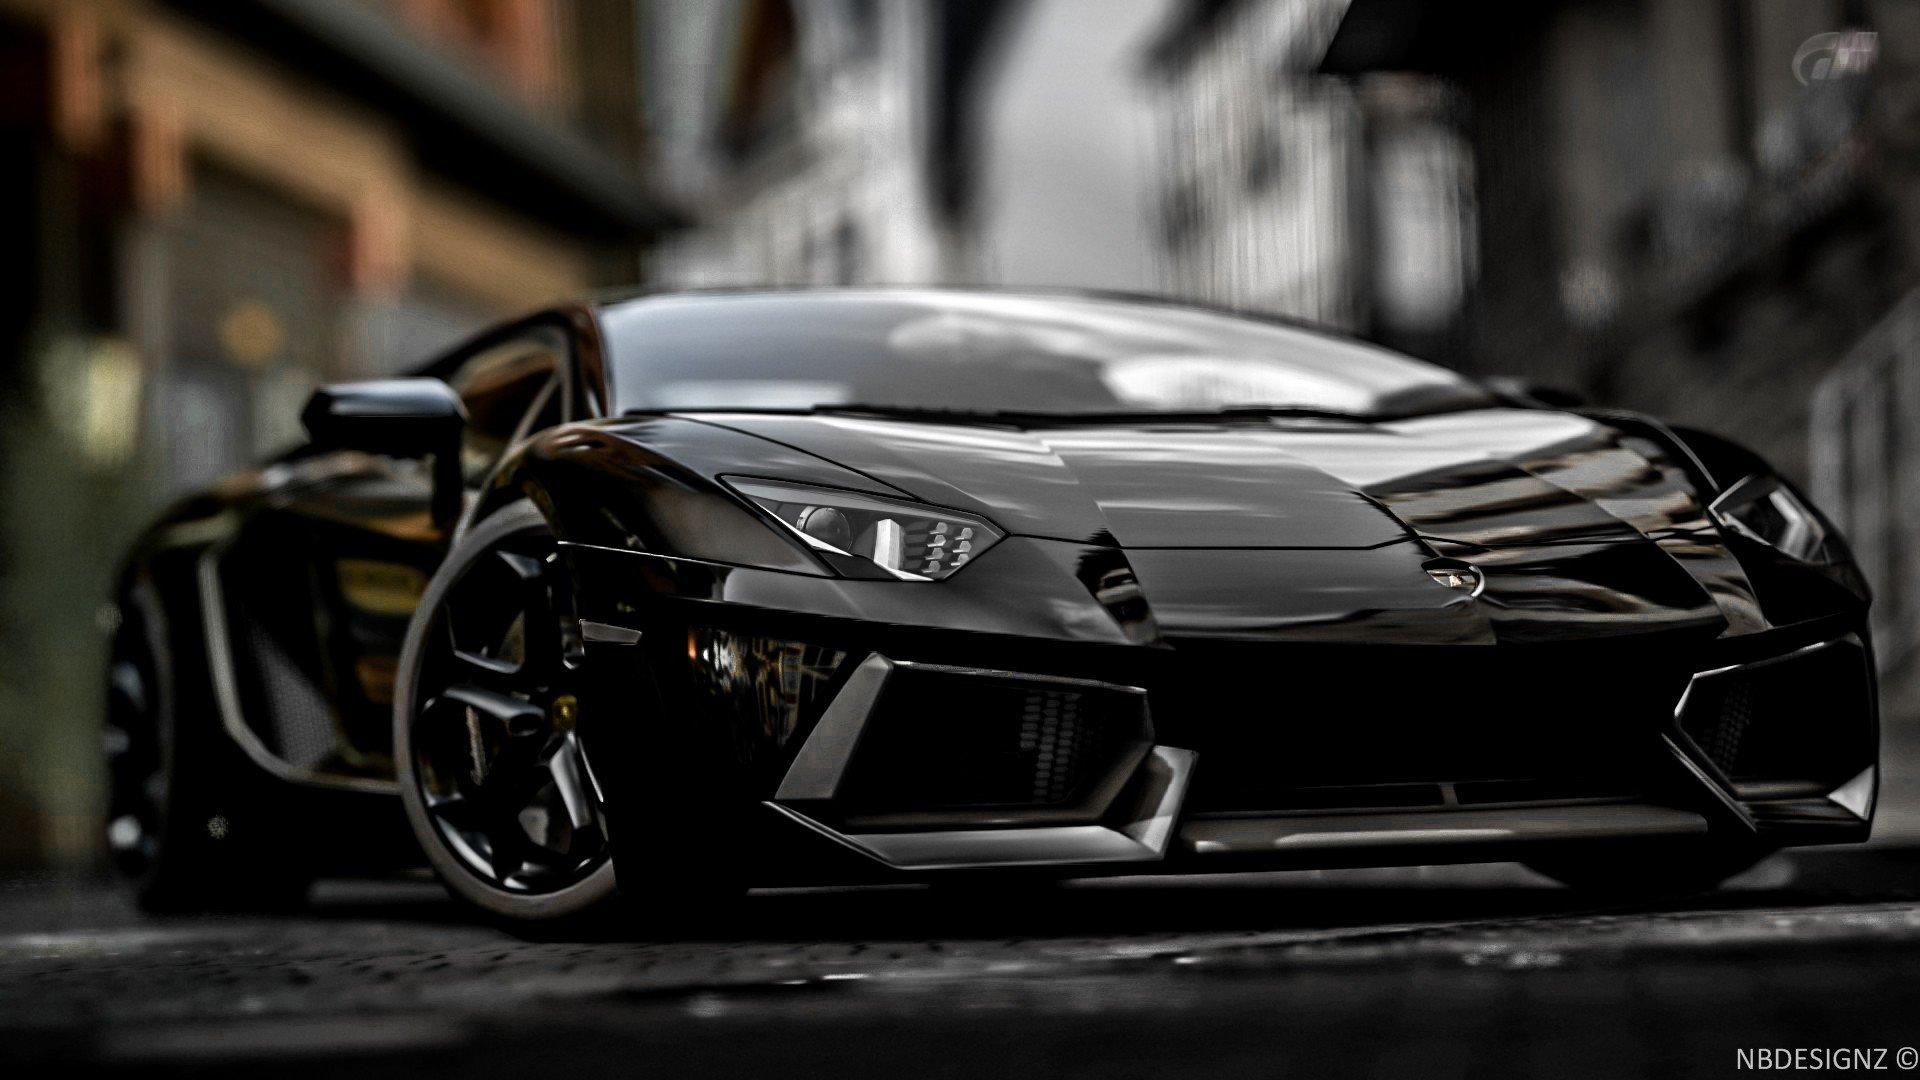 Обои Lamborghini, Облака, красиво, темный фон. Автомобили foto 7